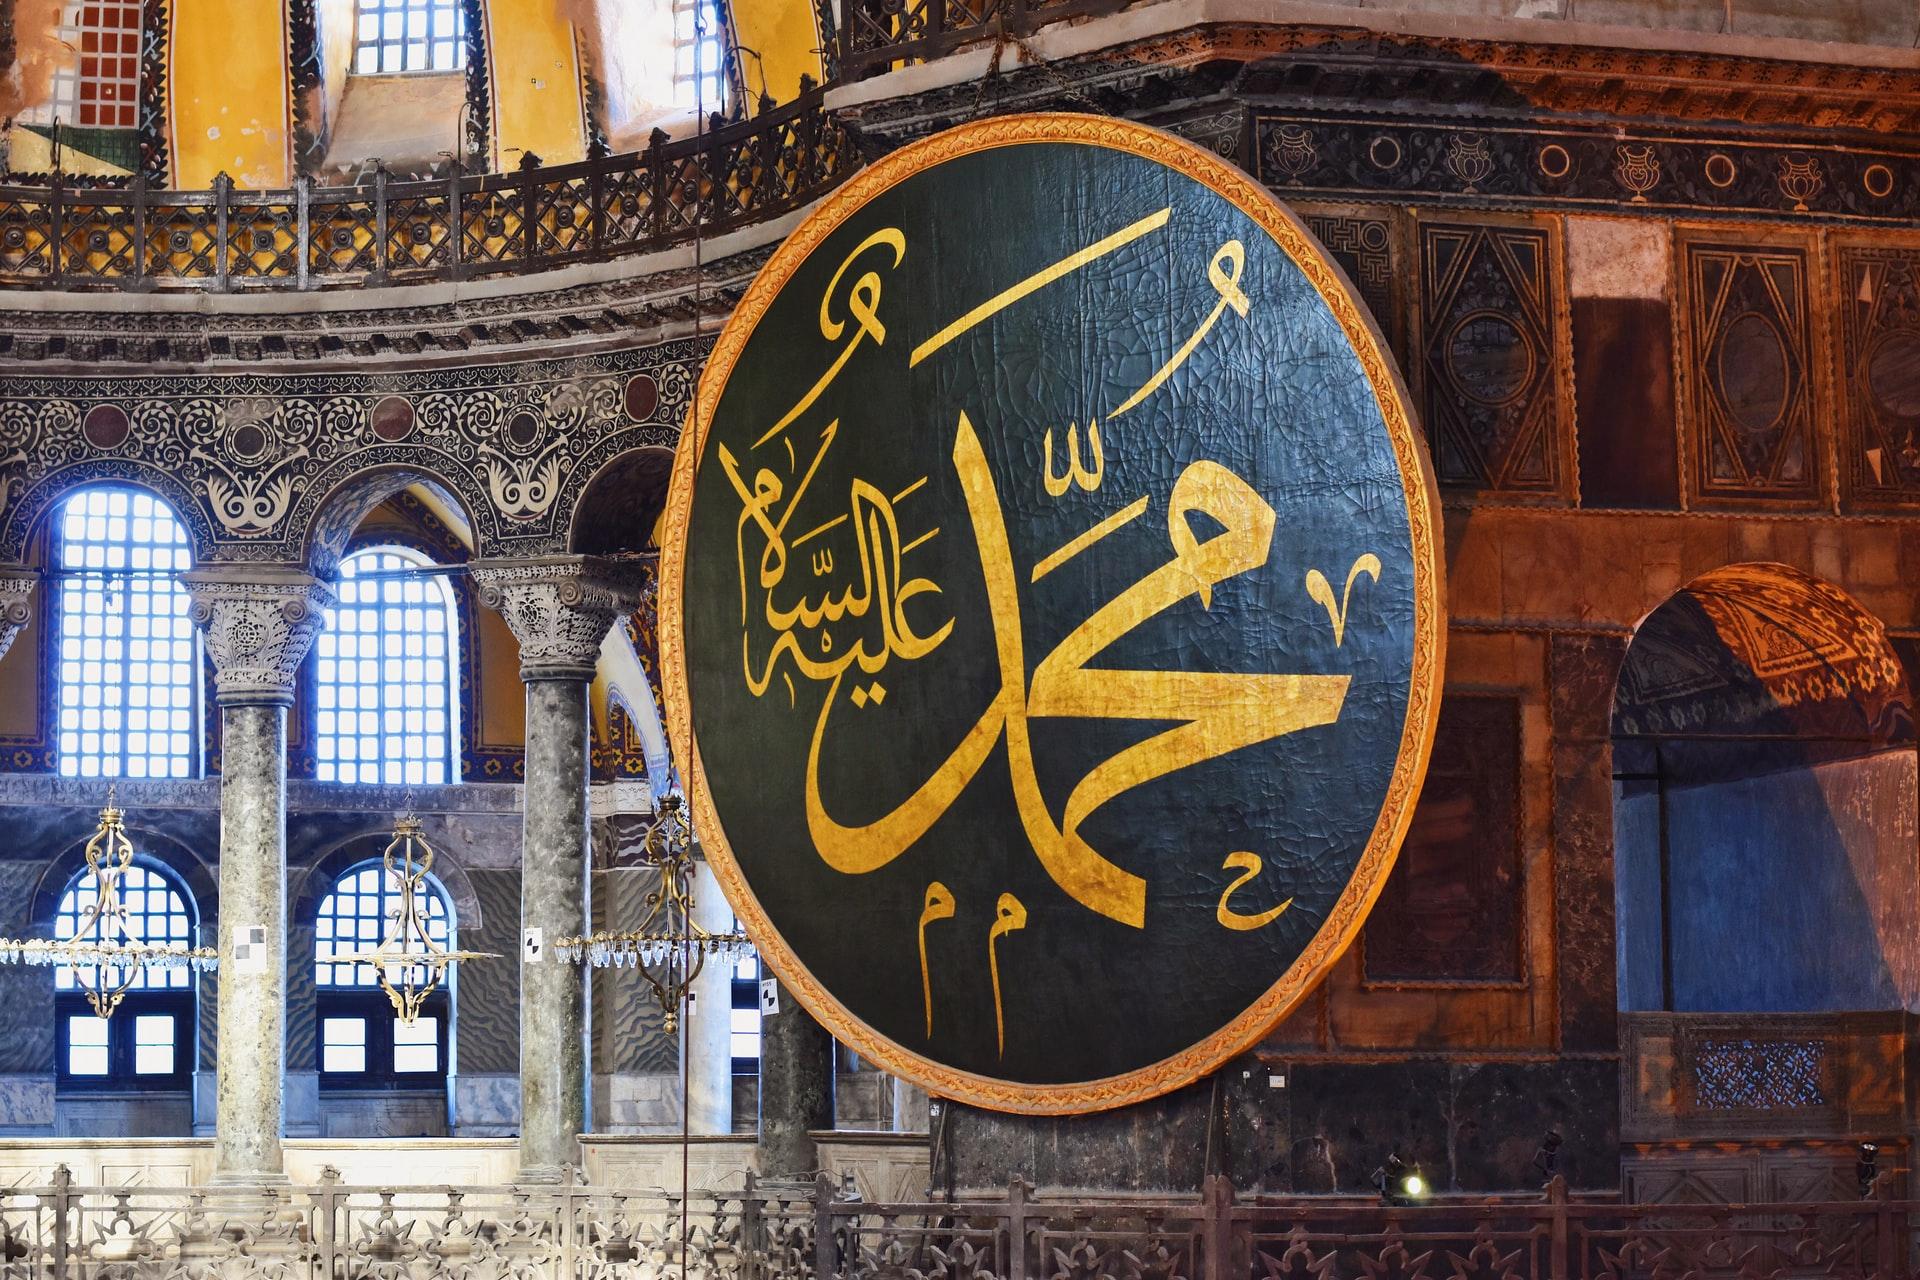 Hagia Sophia decision worrisome for Christians